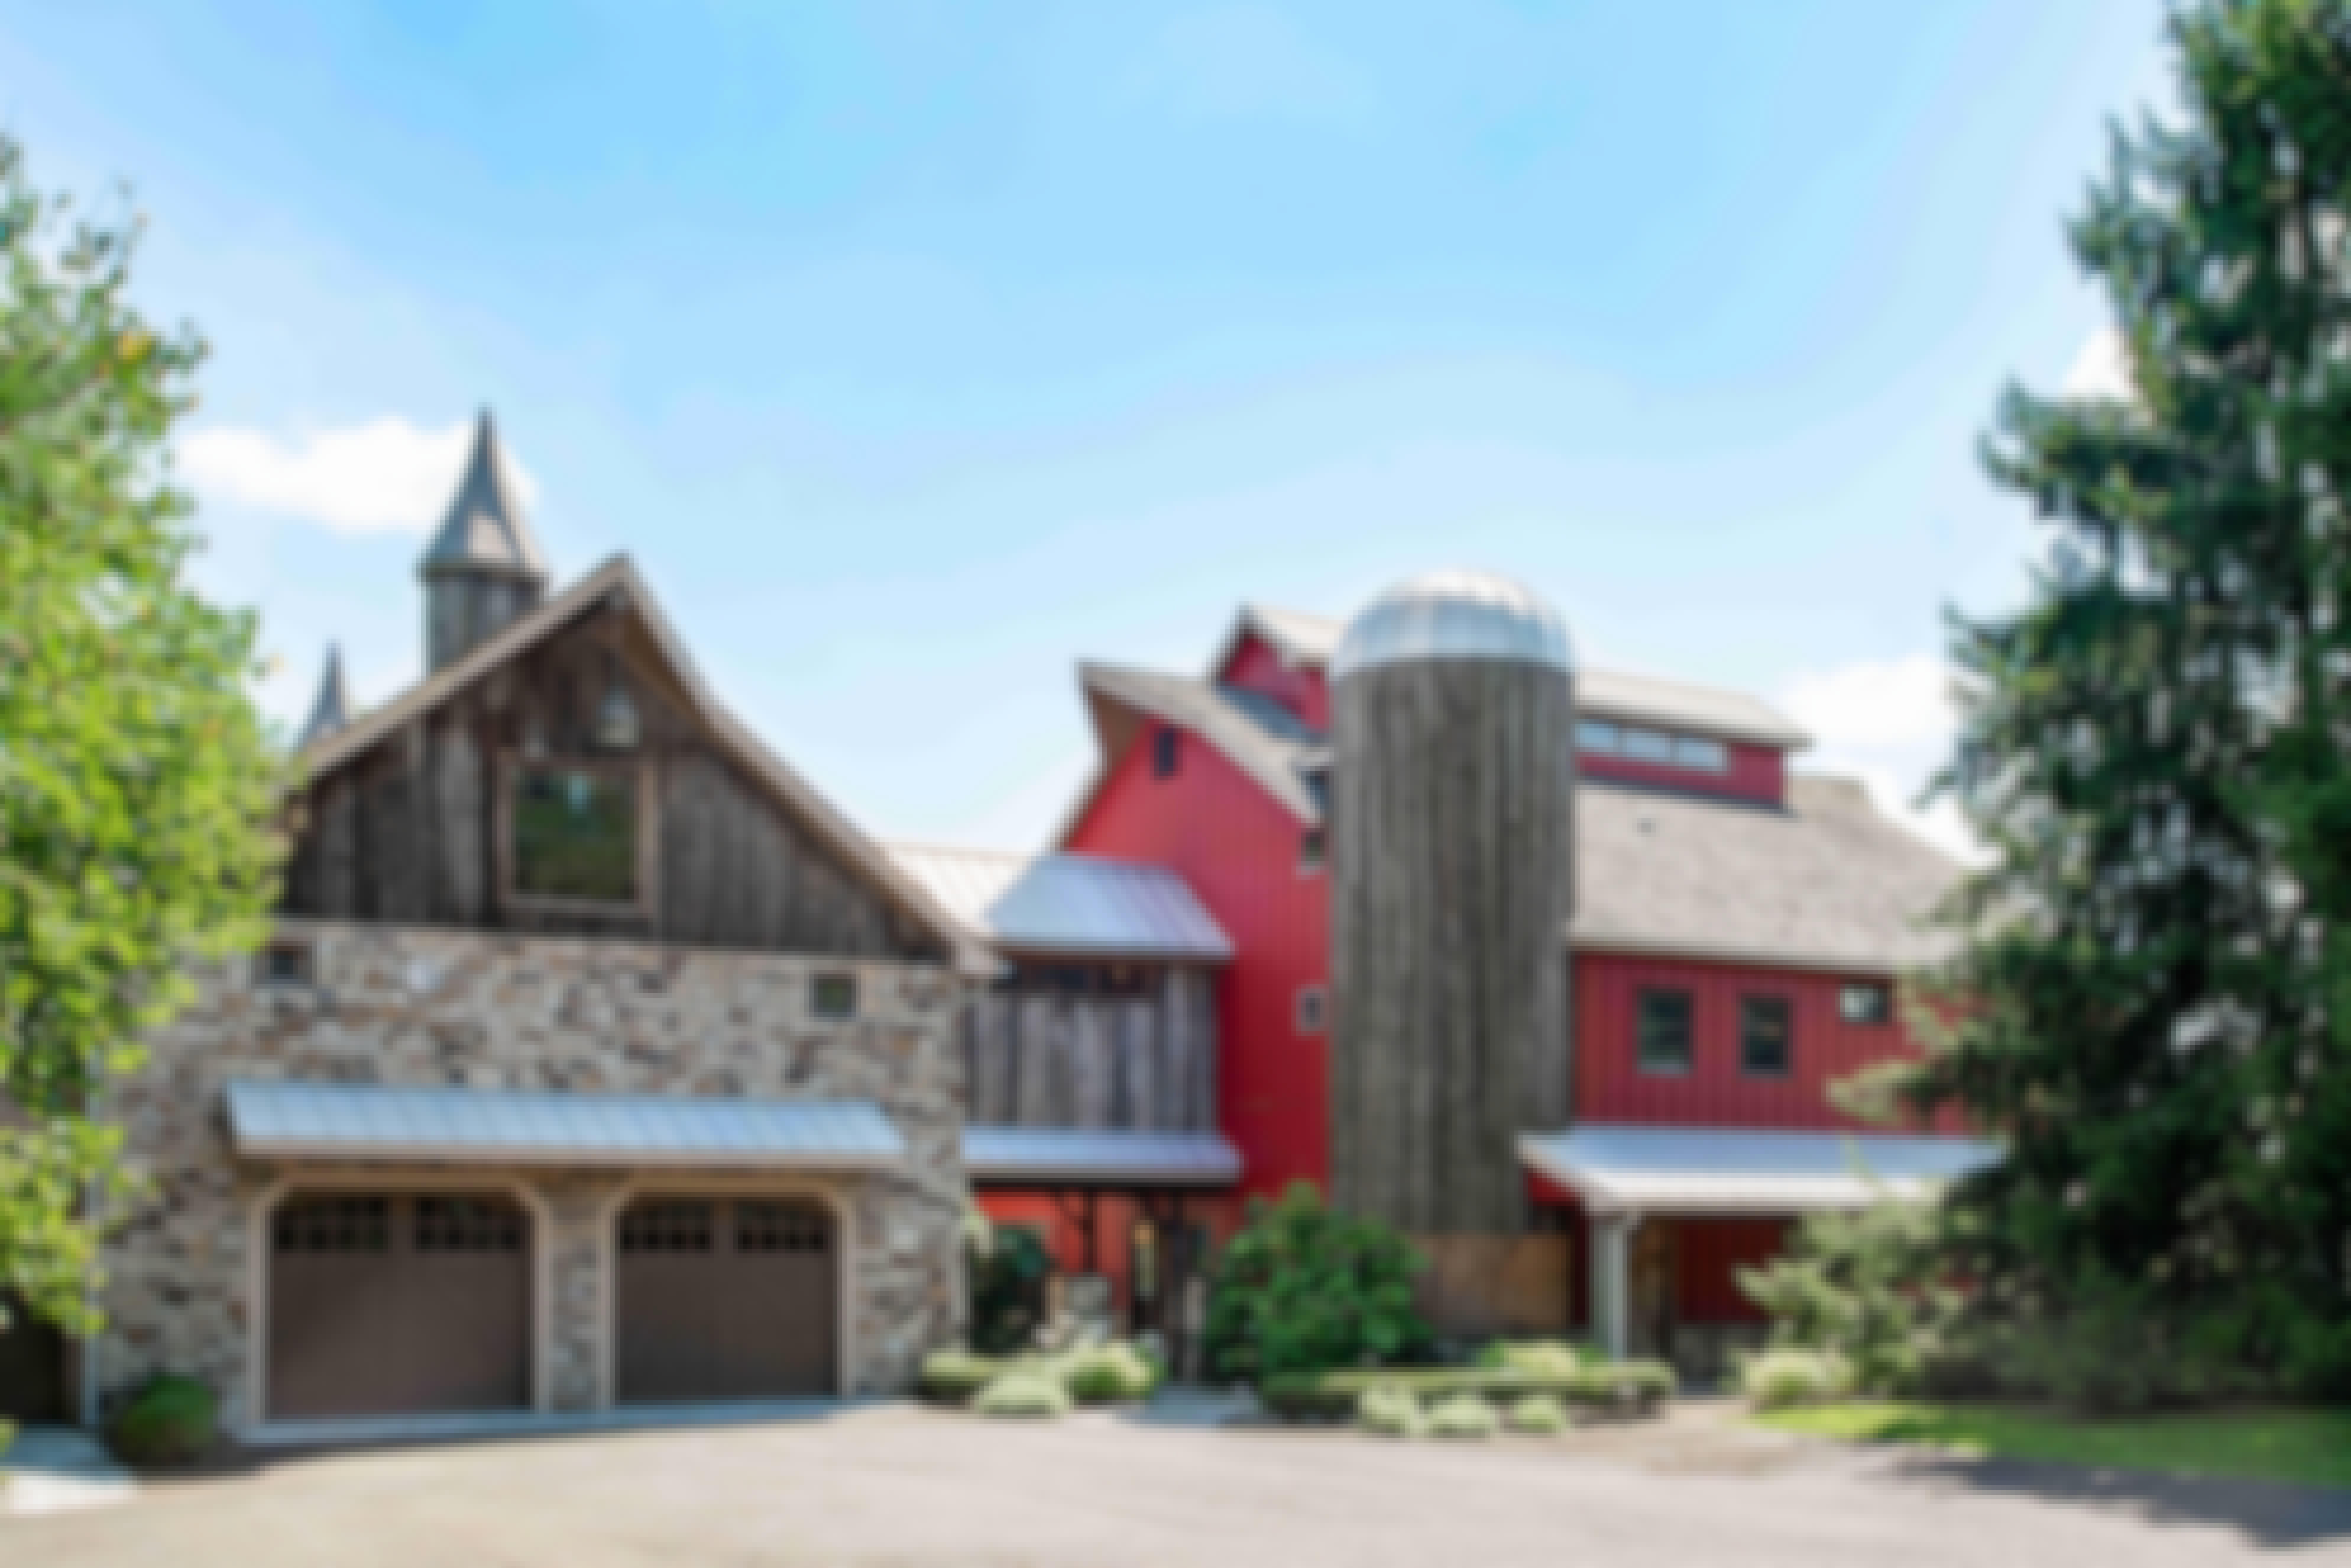 Pennsylvania-barn-converted-into-luxury-home